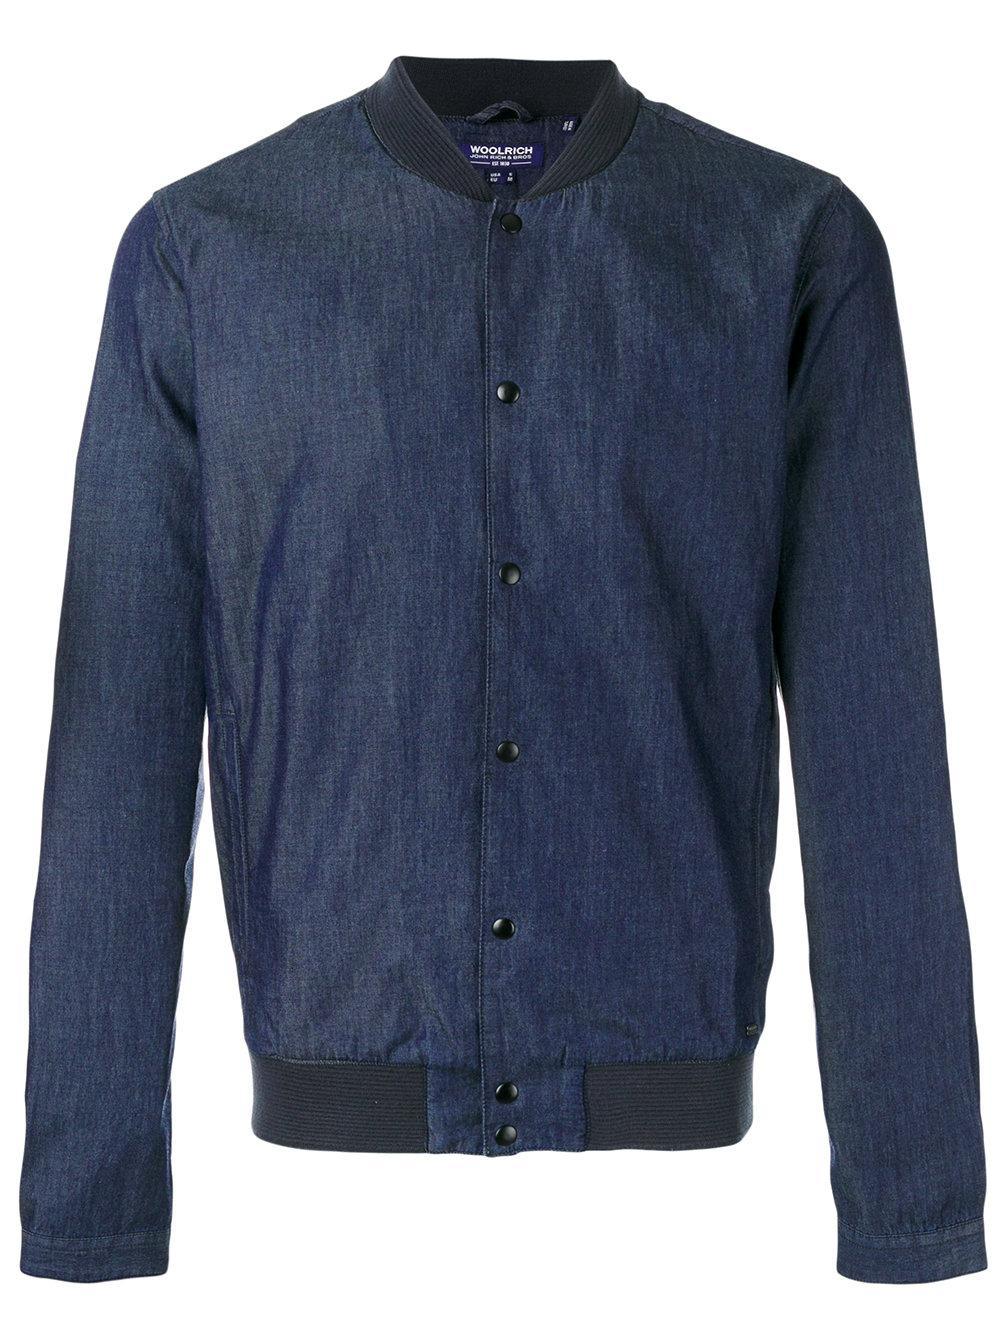 Lyst Woolrich Denim Bomber Jacket In Blue For Men